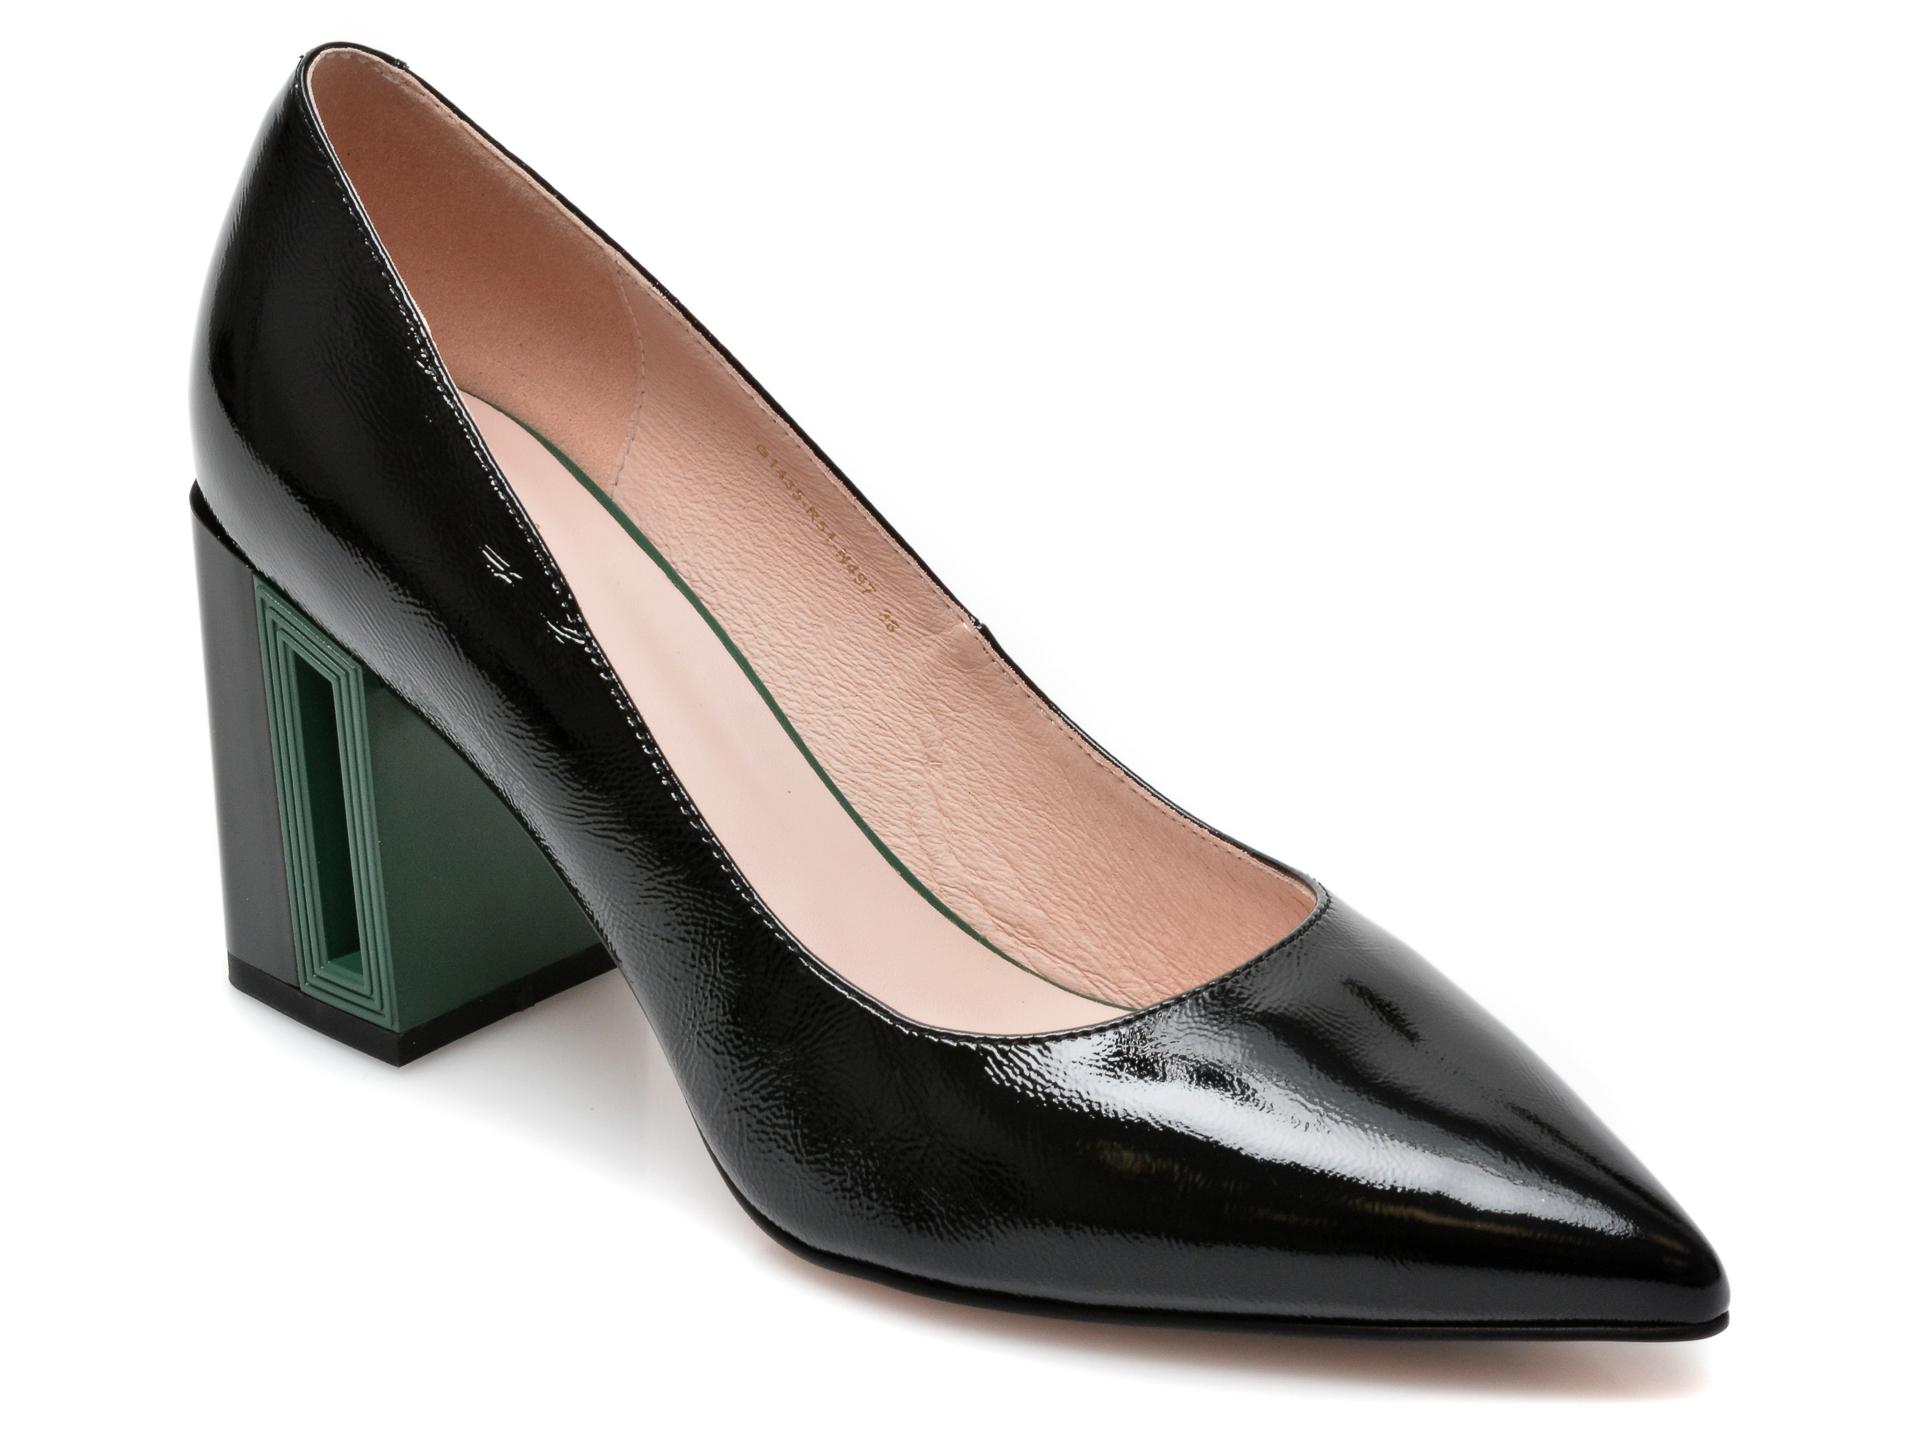 Pantofi FLAVIA PASSINI negri, G1435R5, din piele naturala lacuita imagine otter.ro 2021